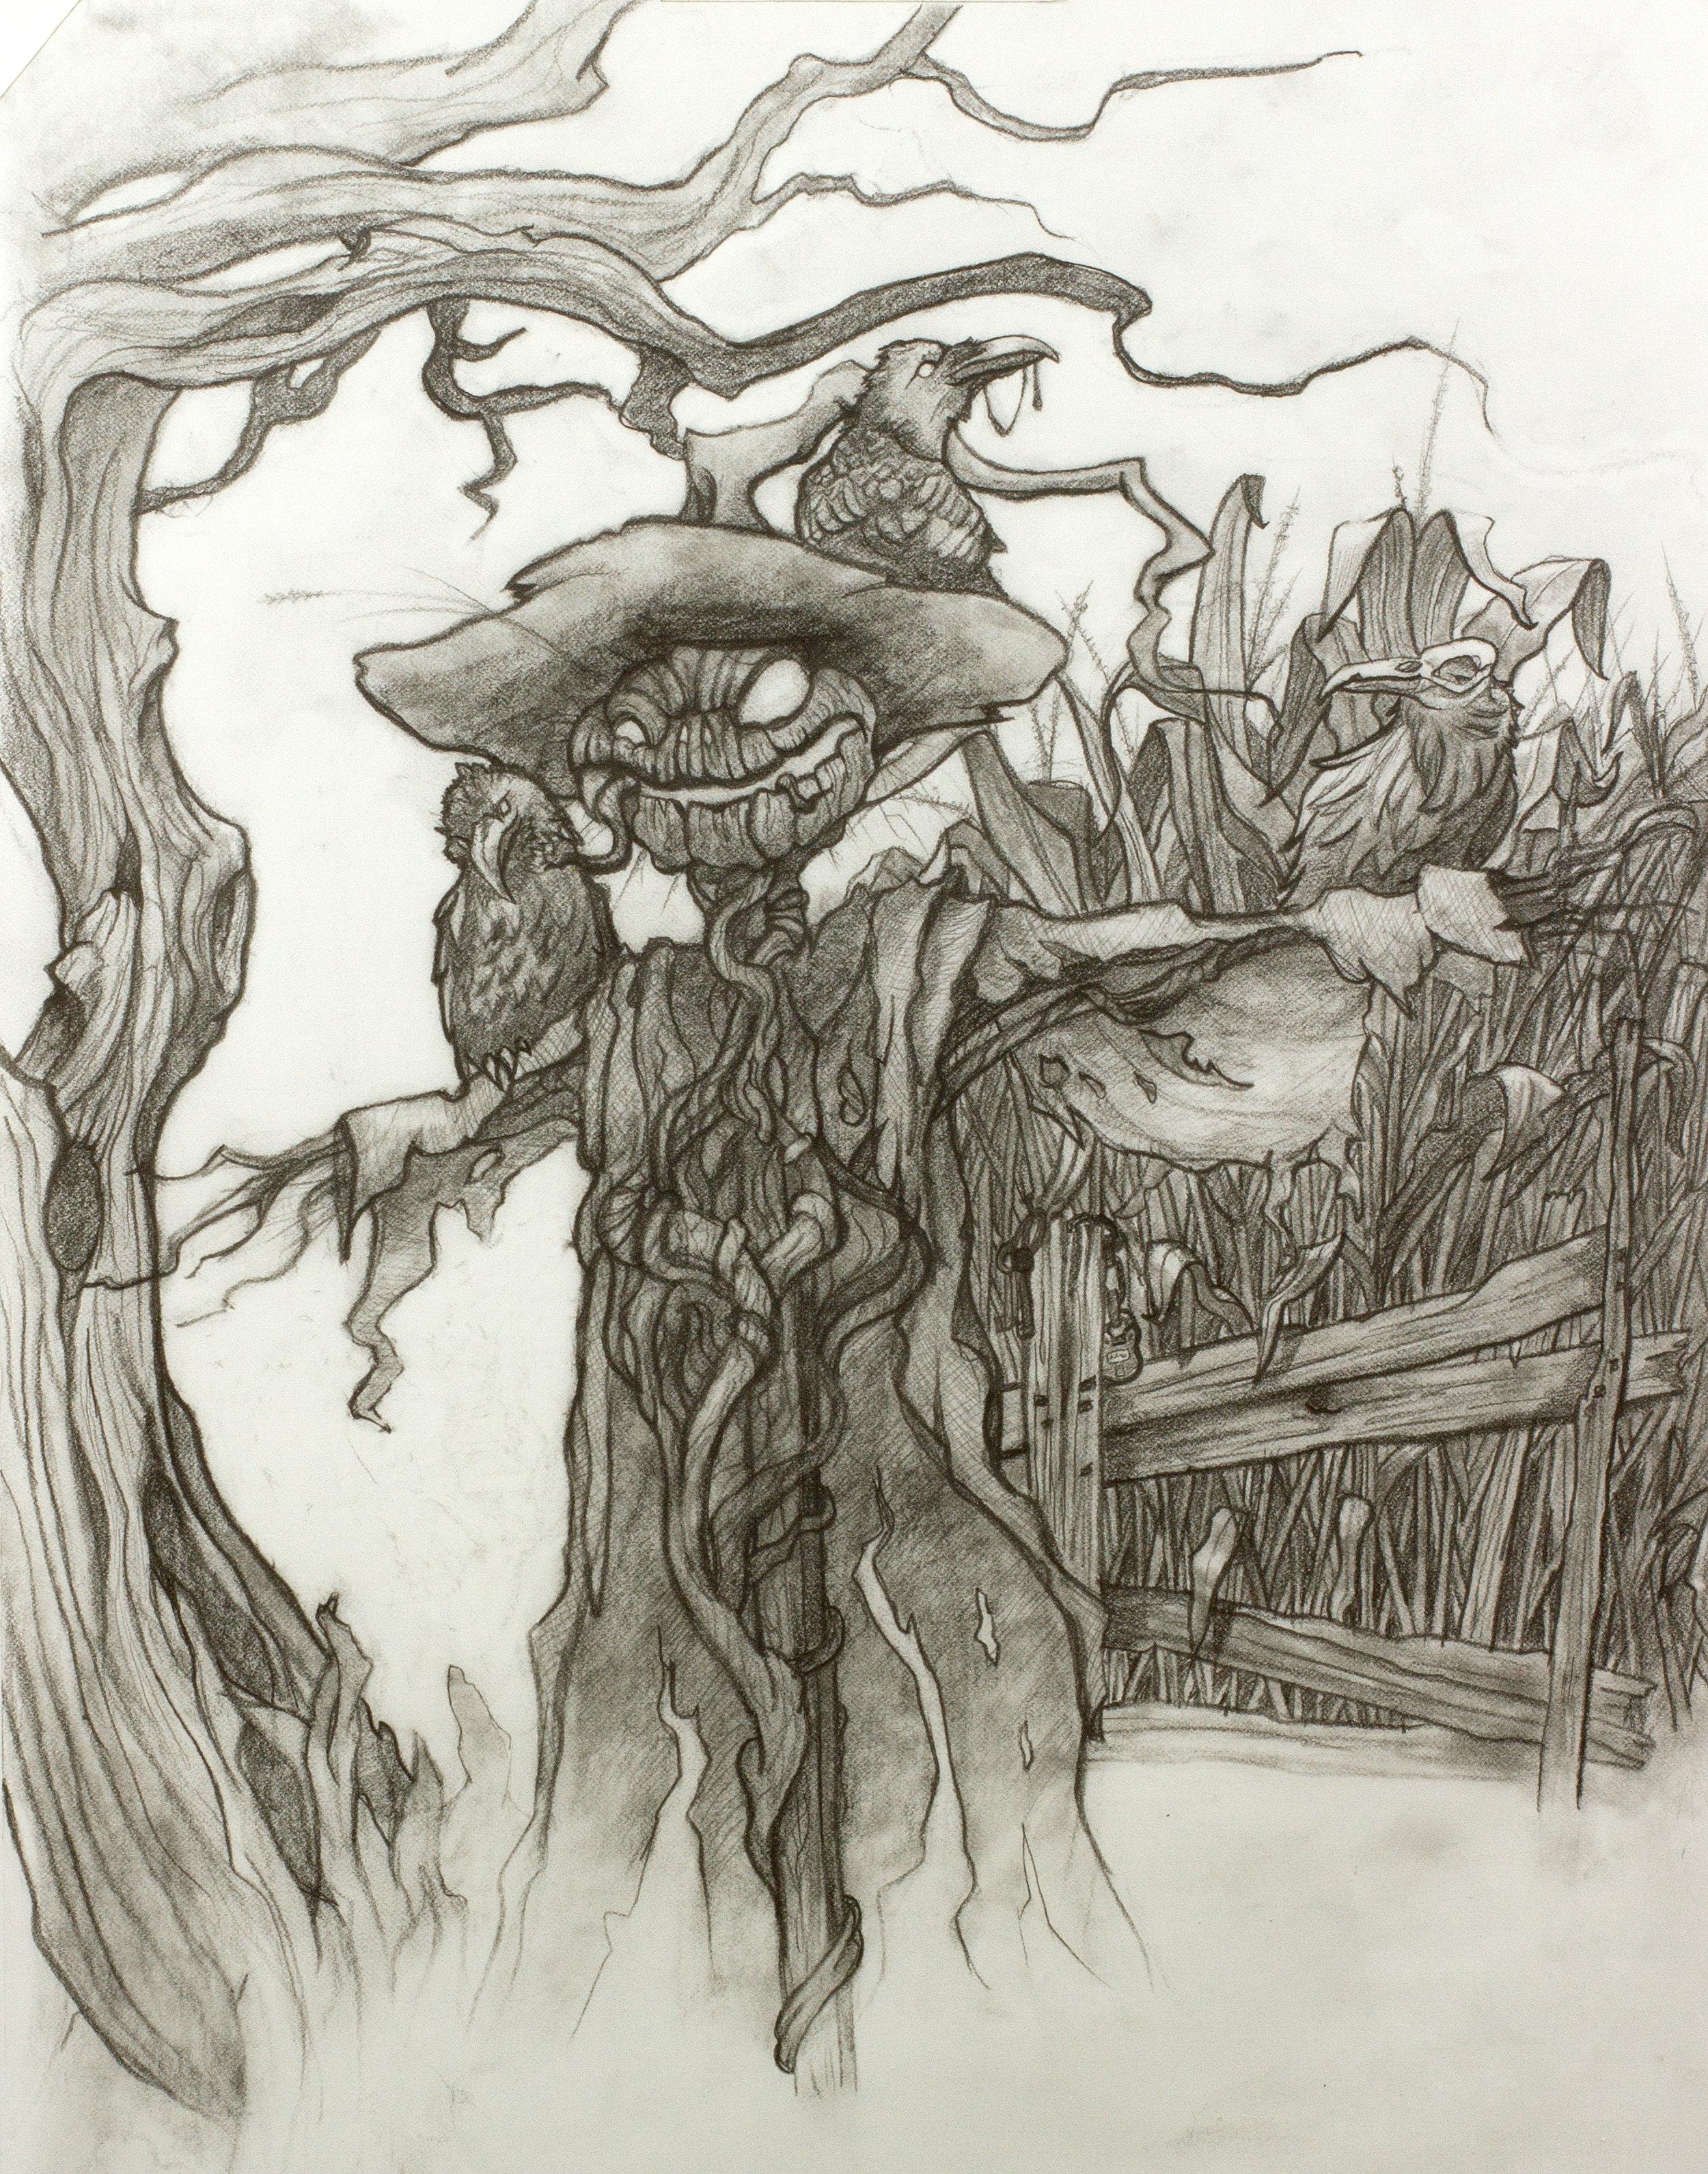 Original drawing for Field of Screams